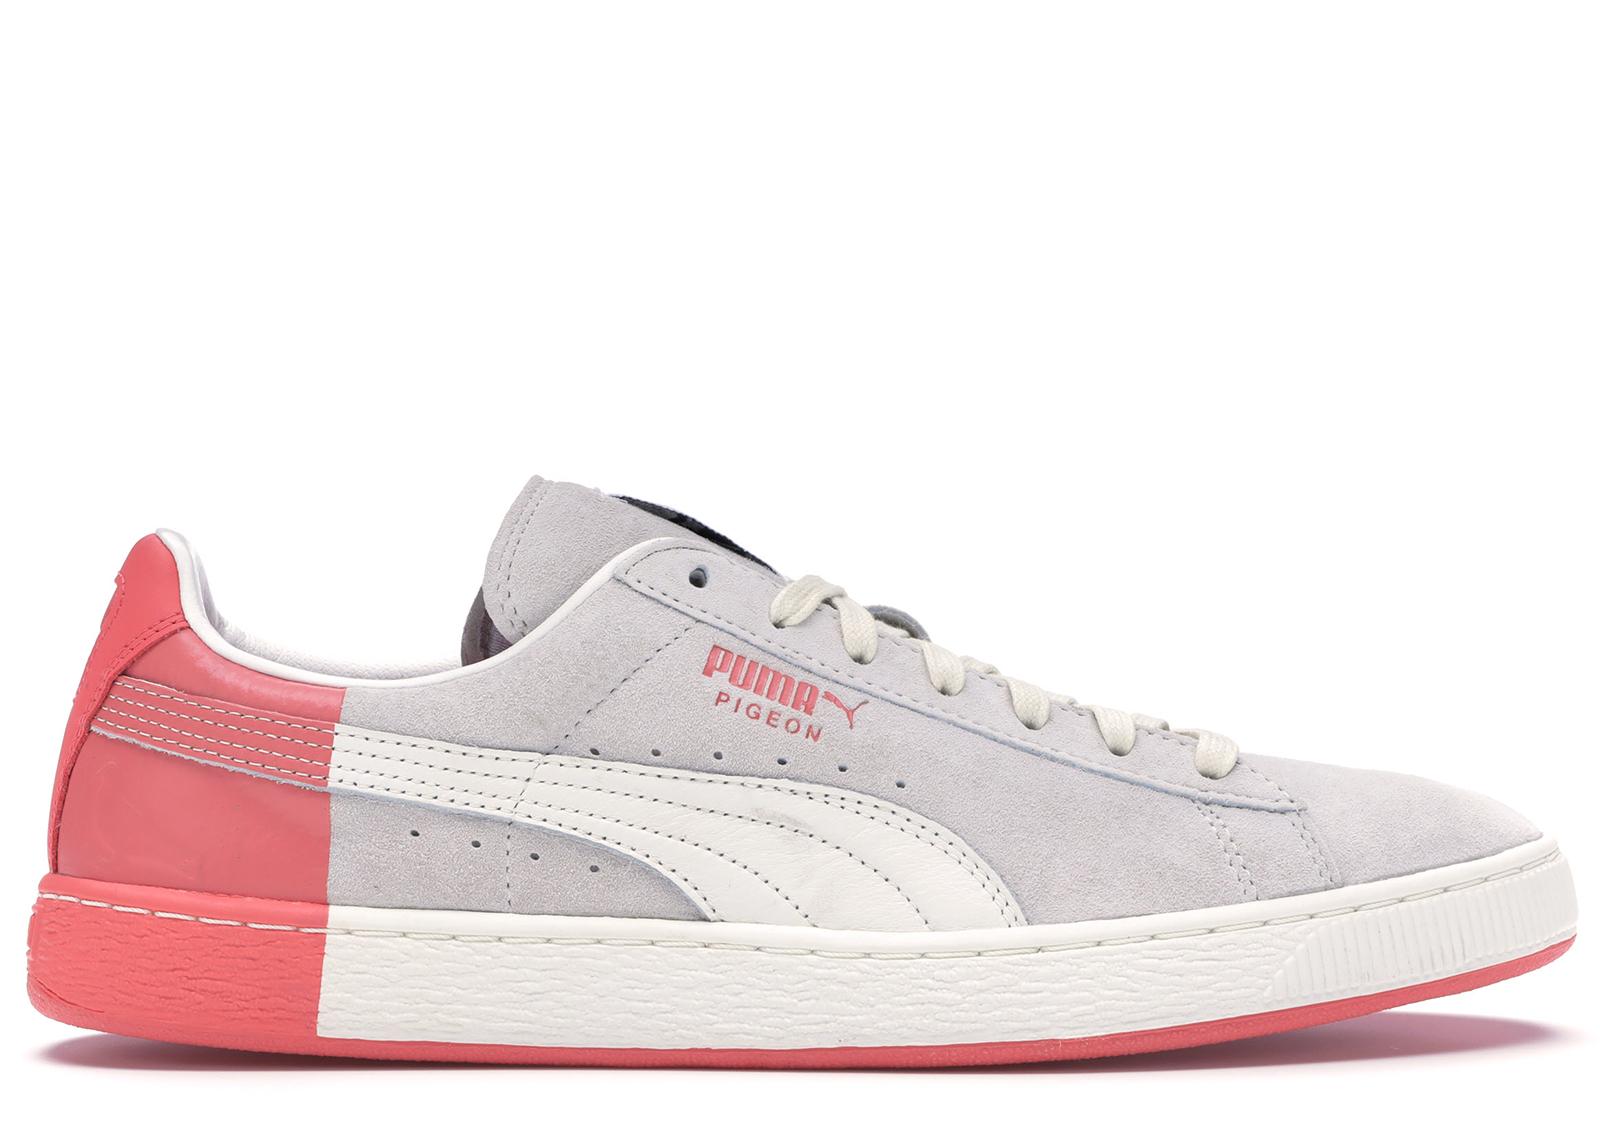 Puma Suede White Staple Pigeon - 361617-01